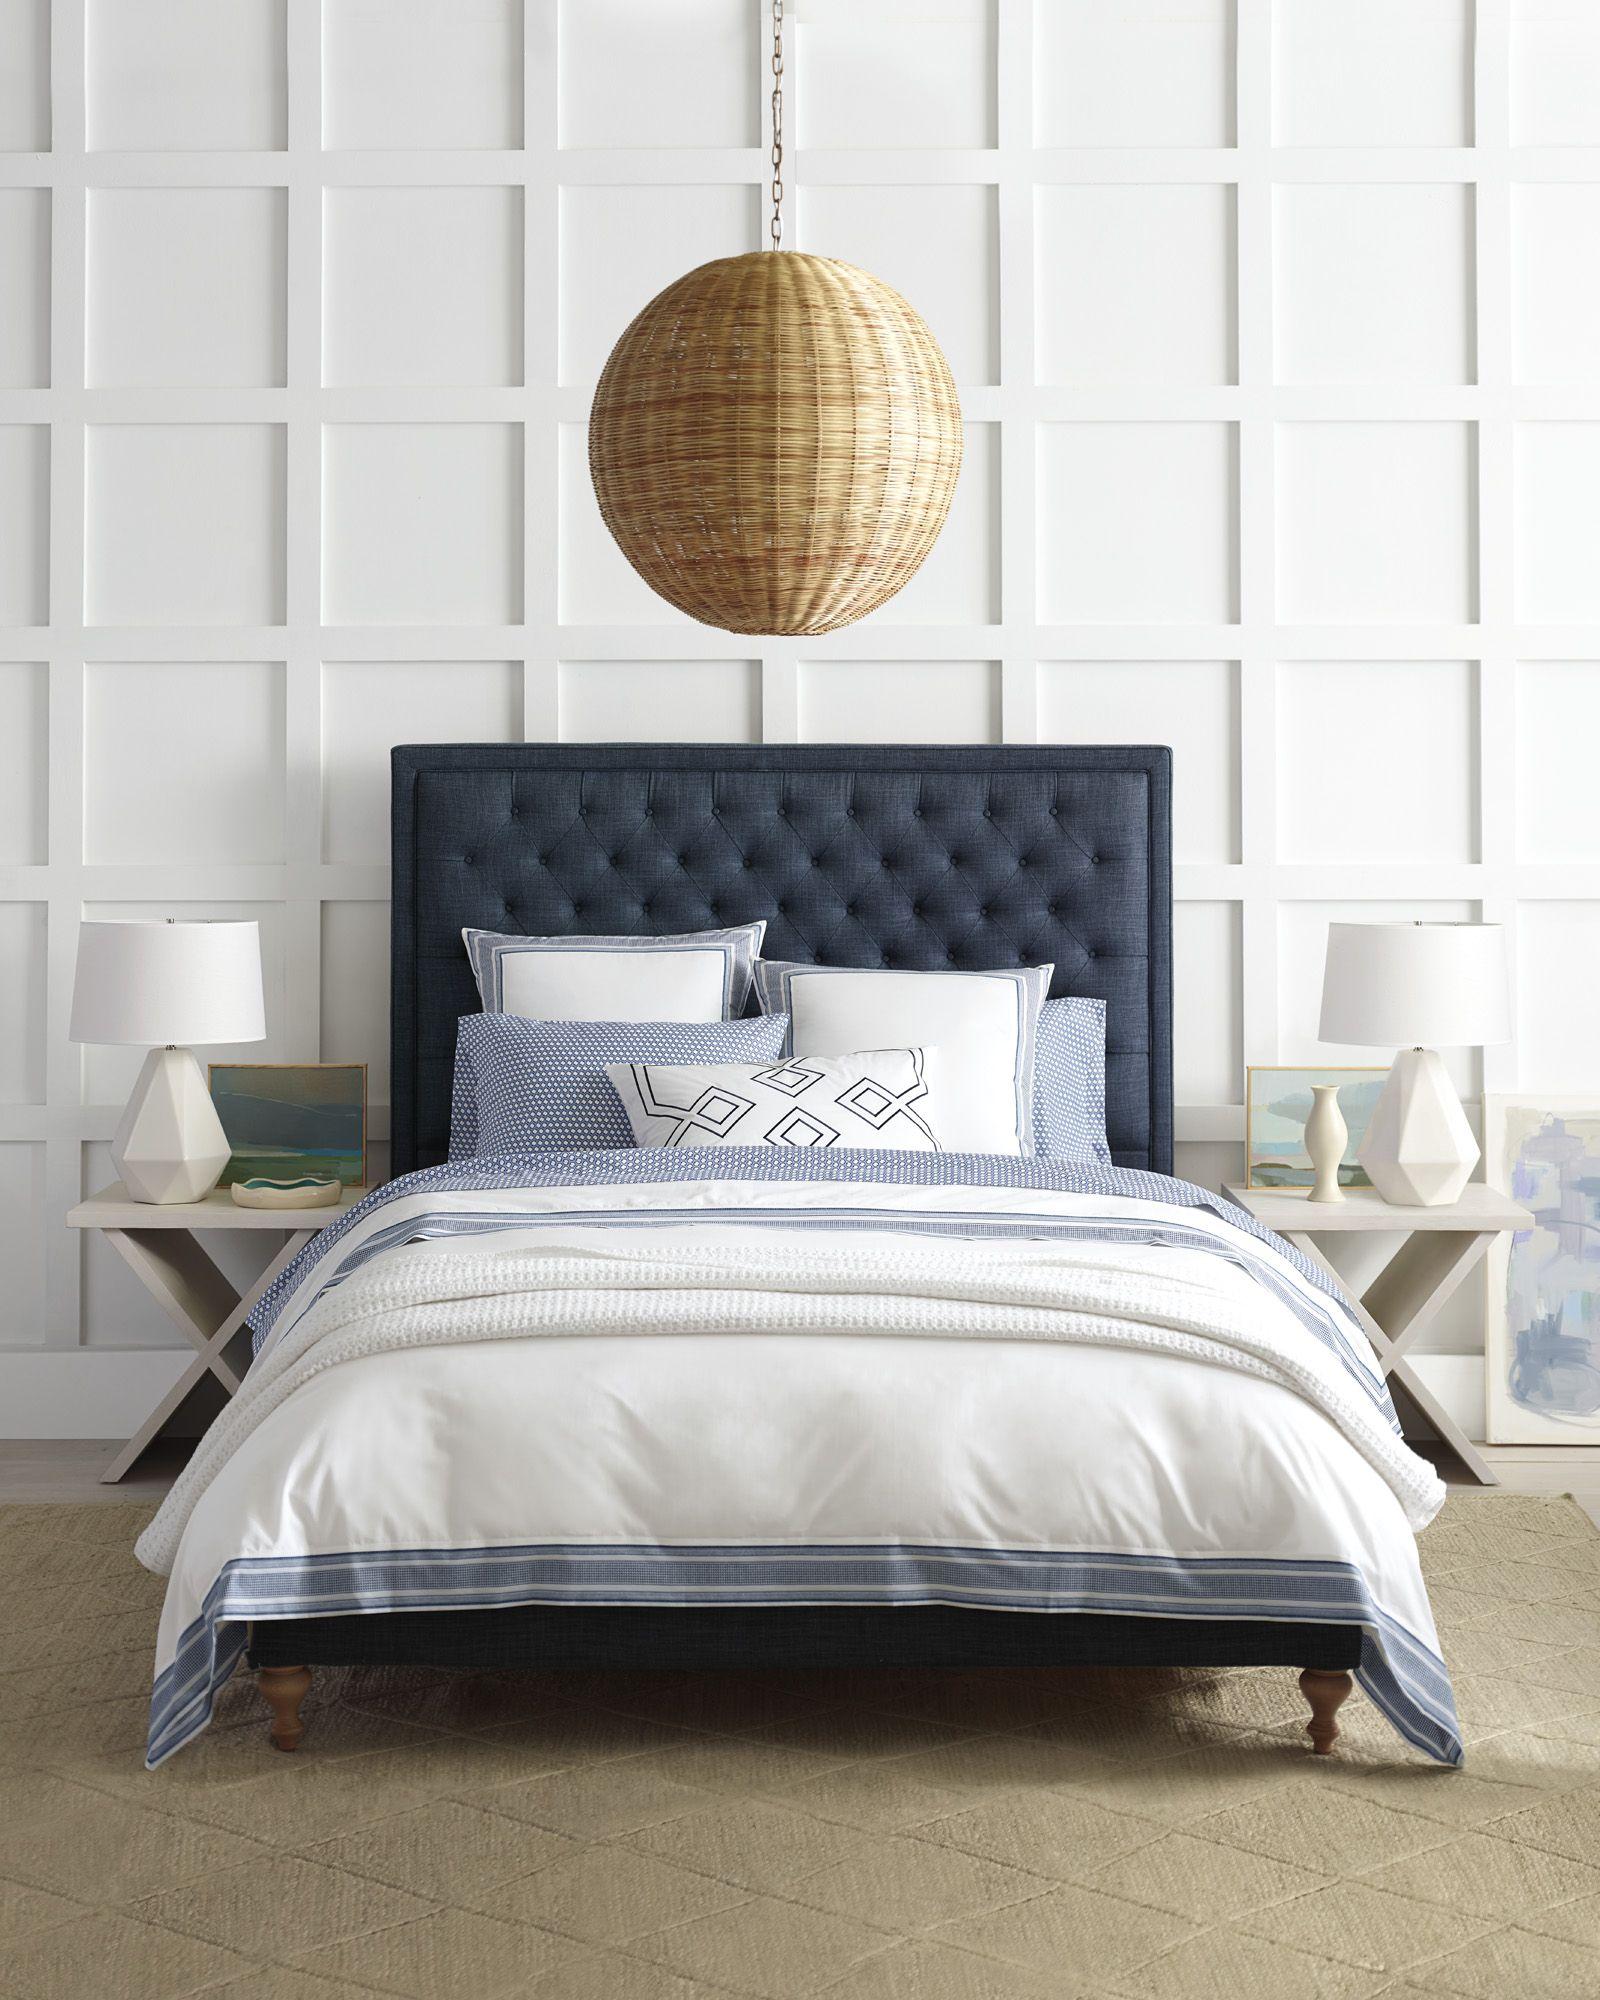 10 dreamy headboards that wish you good night bedroom ideas rh pinterest ch